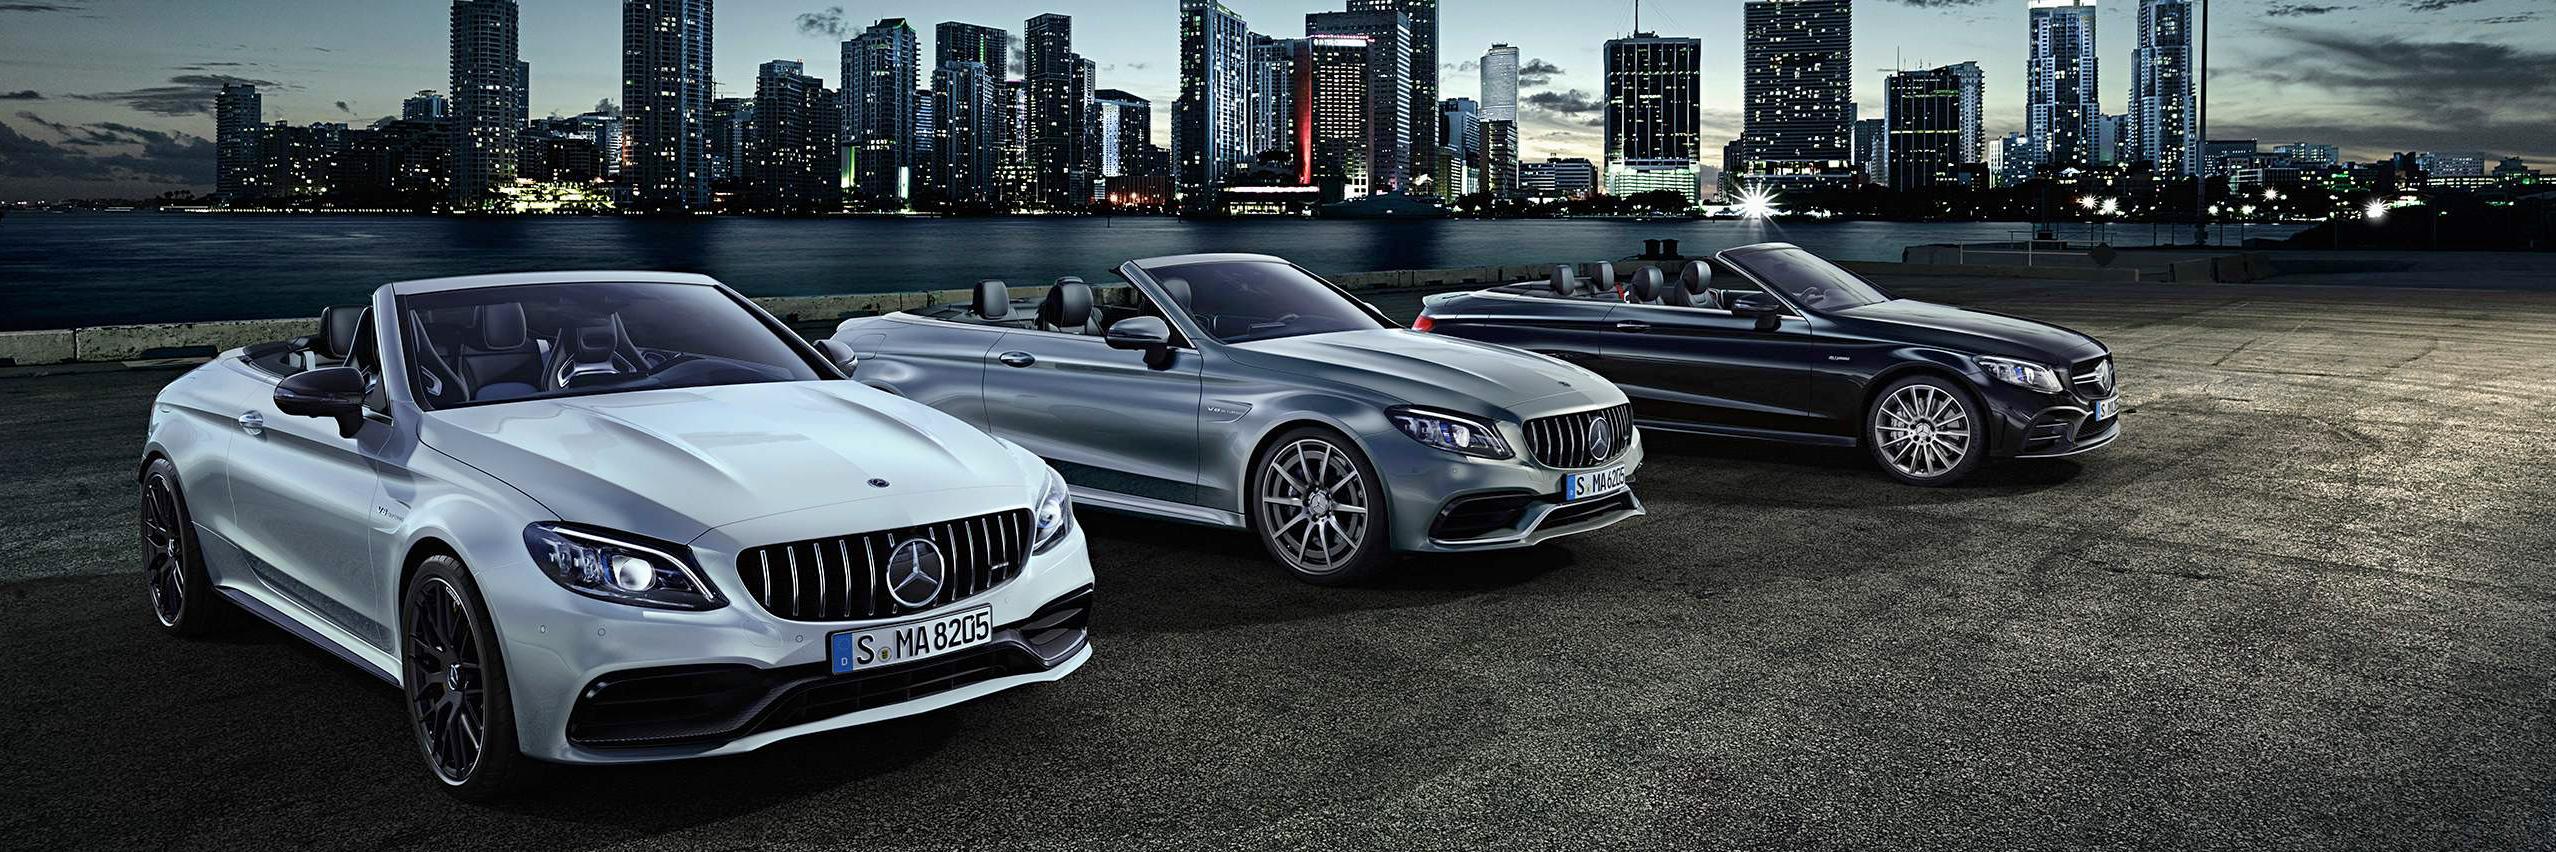 CAR-Avenue-Mercedes-AMG-Classe-E-Cabriolet-06